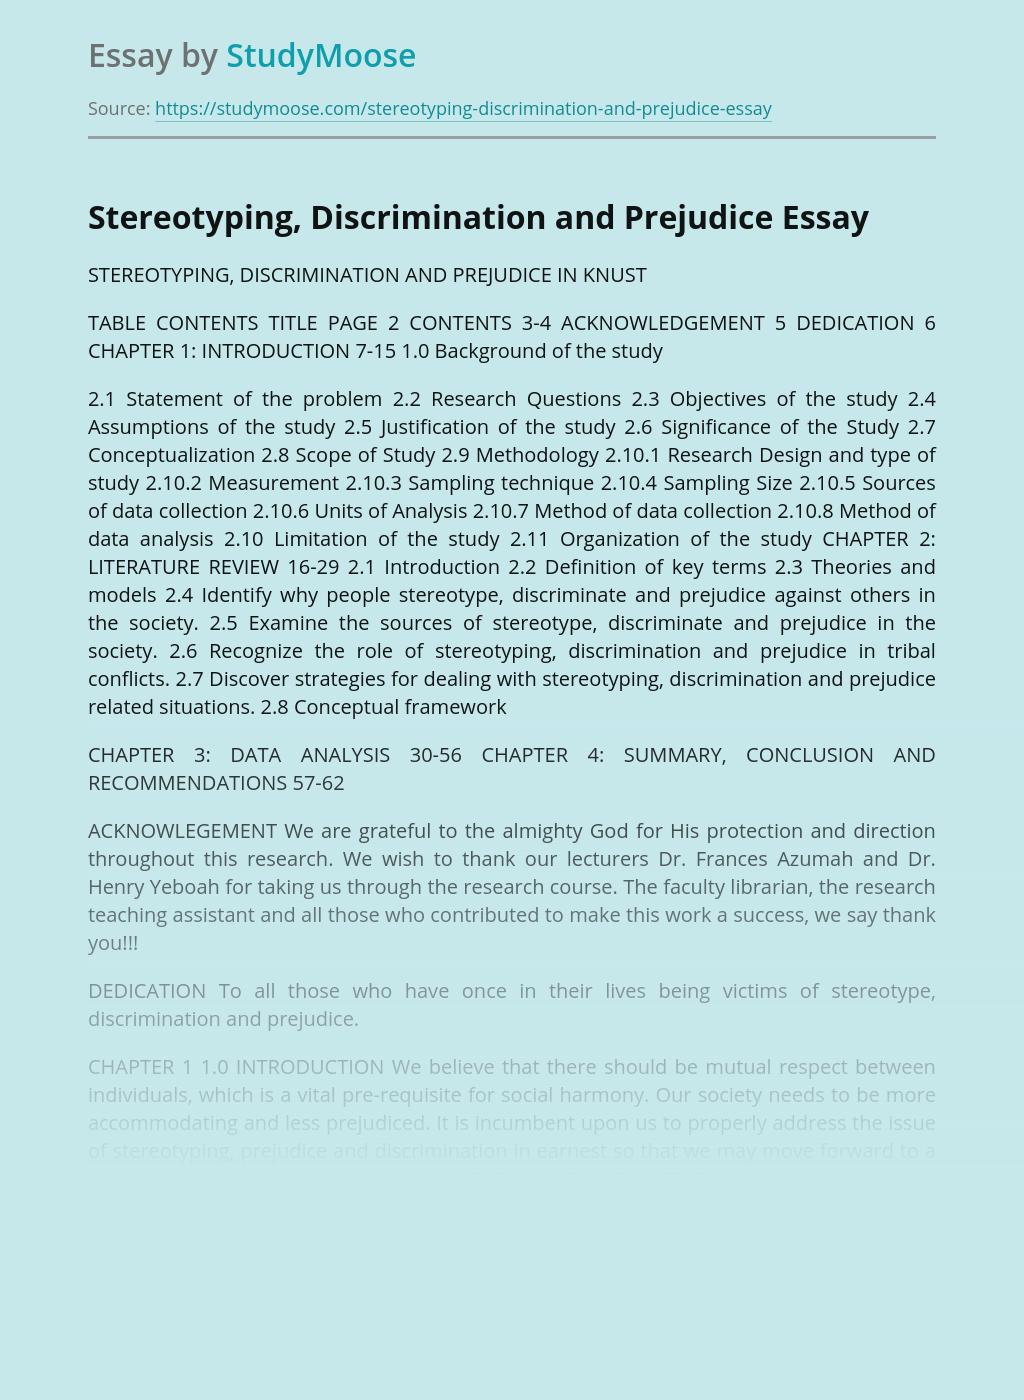 Stereotyping, Discrimination and Prejudice